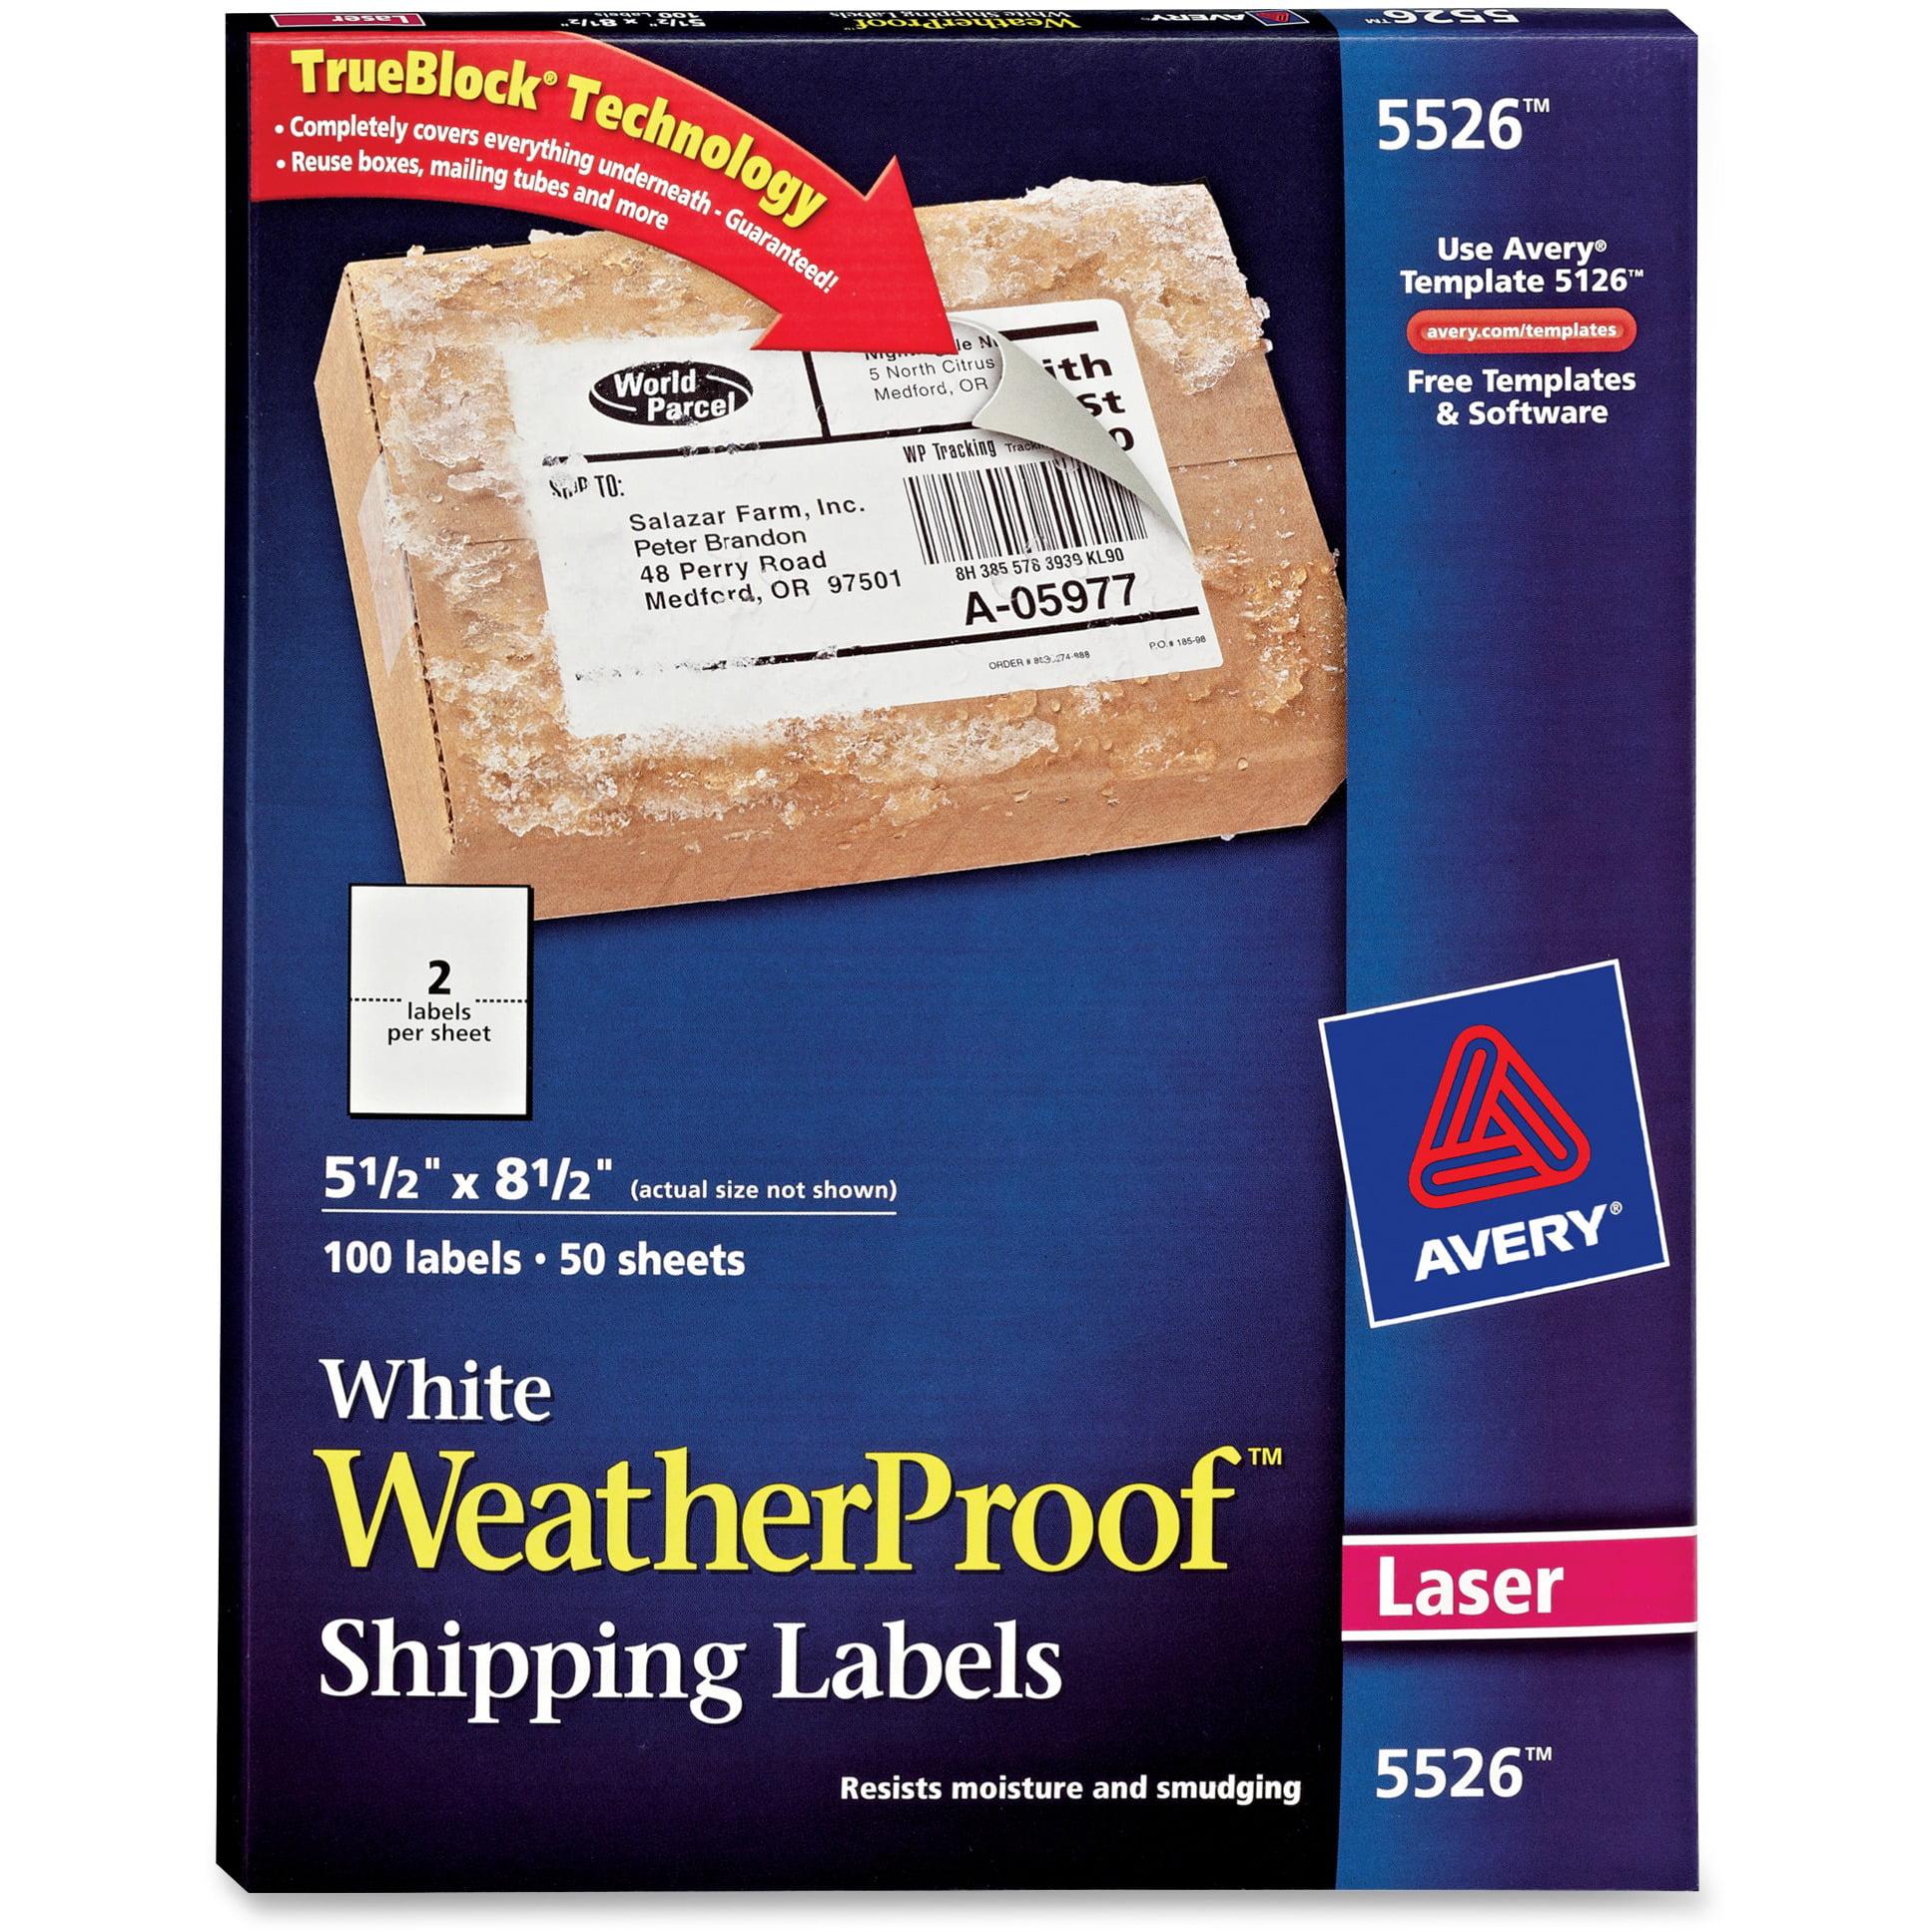 Avery WeatherProof Shipping Labels w/TrueBlock, Laser, White, 5 1/2 x 8 1/2, 100/Pack